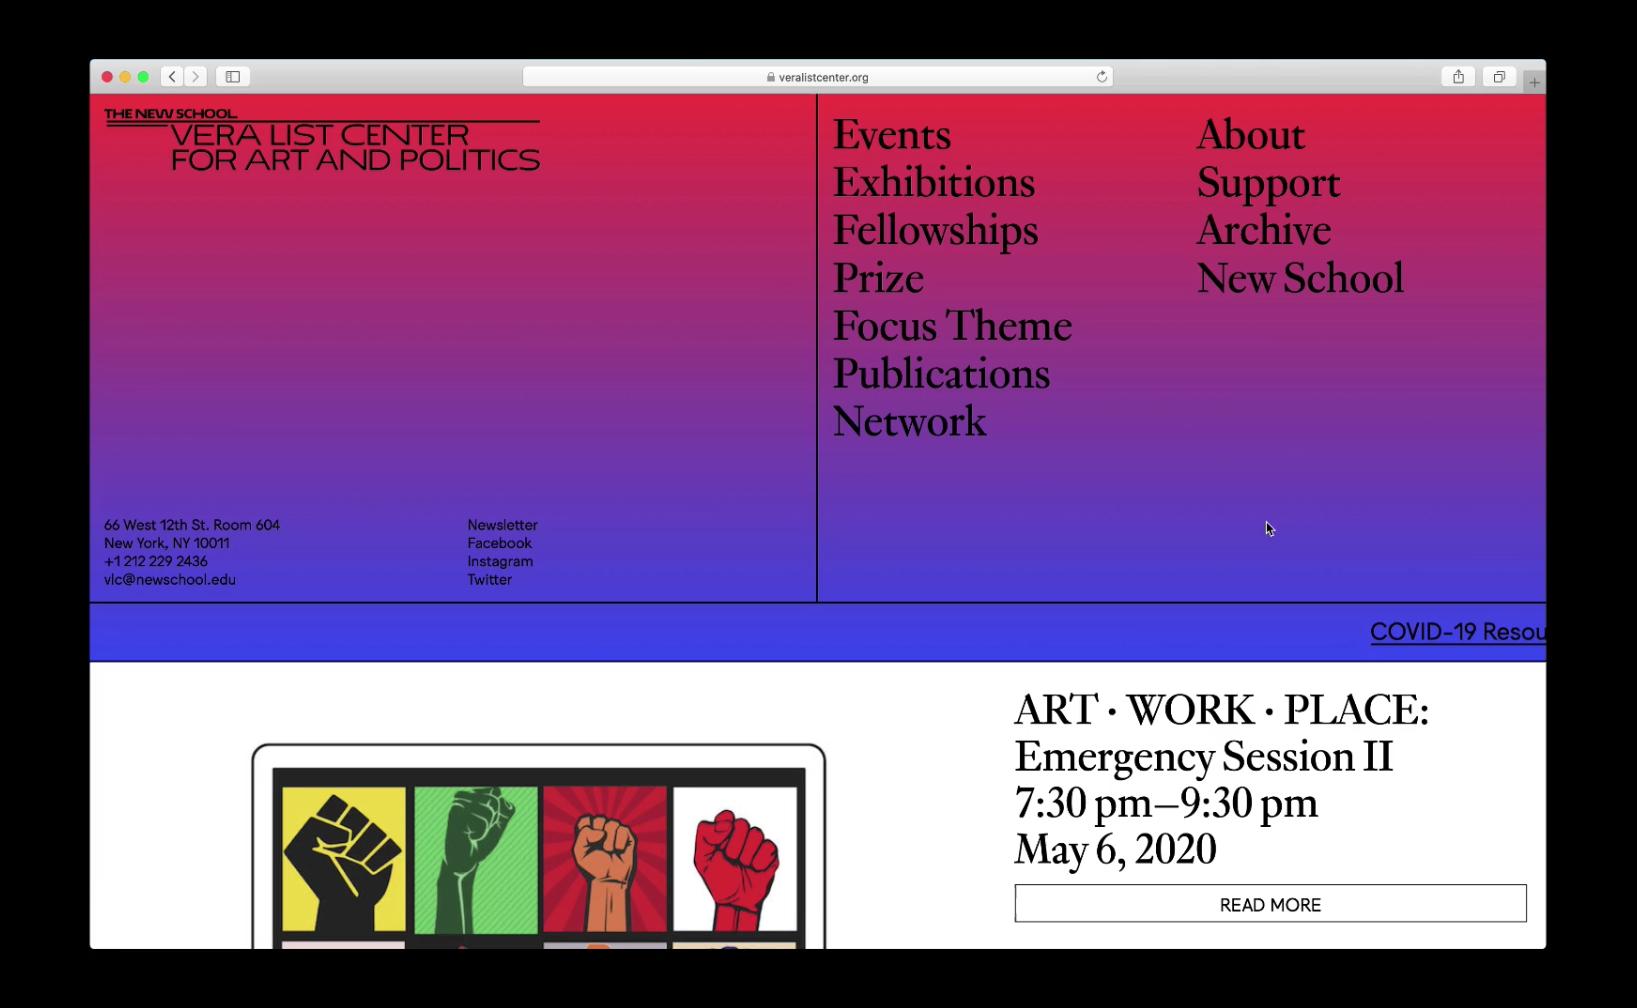 Vera List Center for Art and Politics